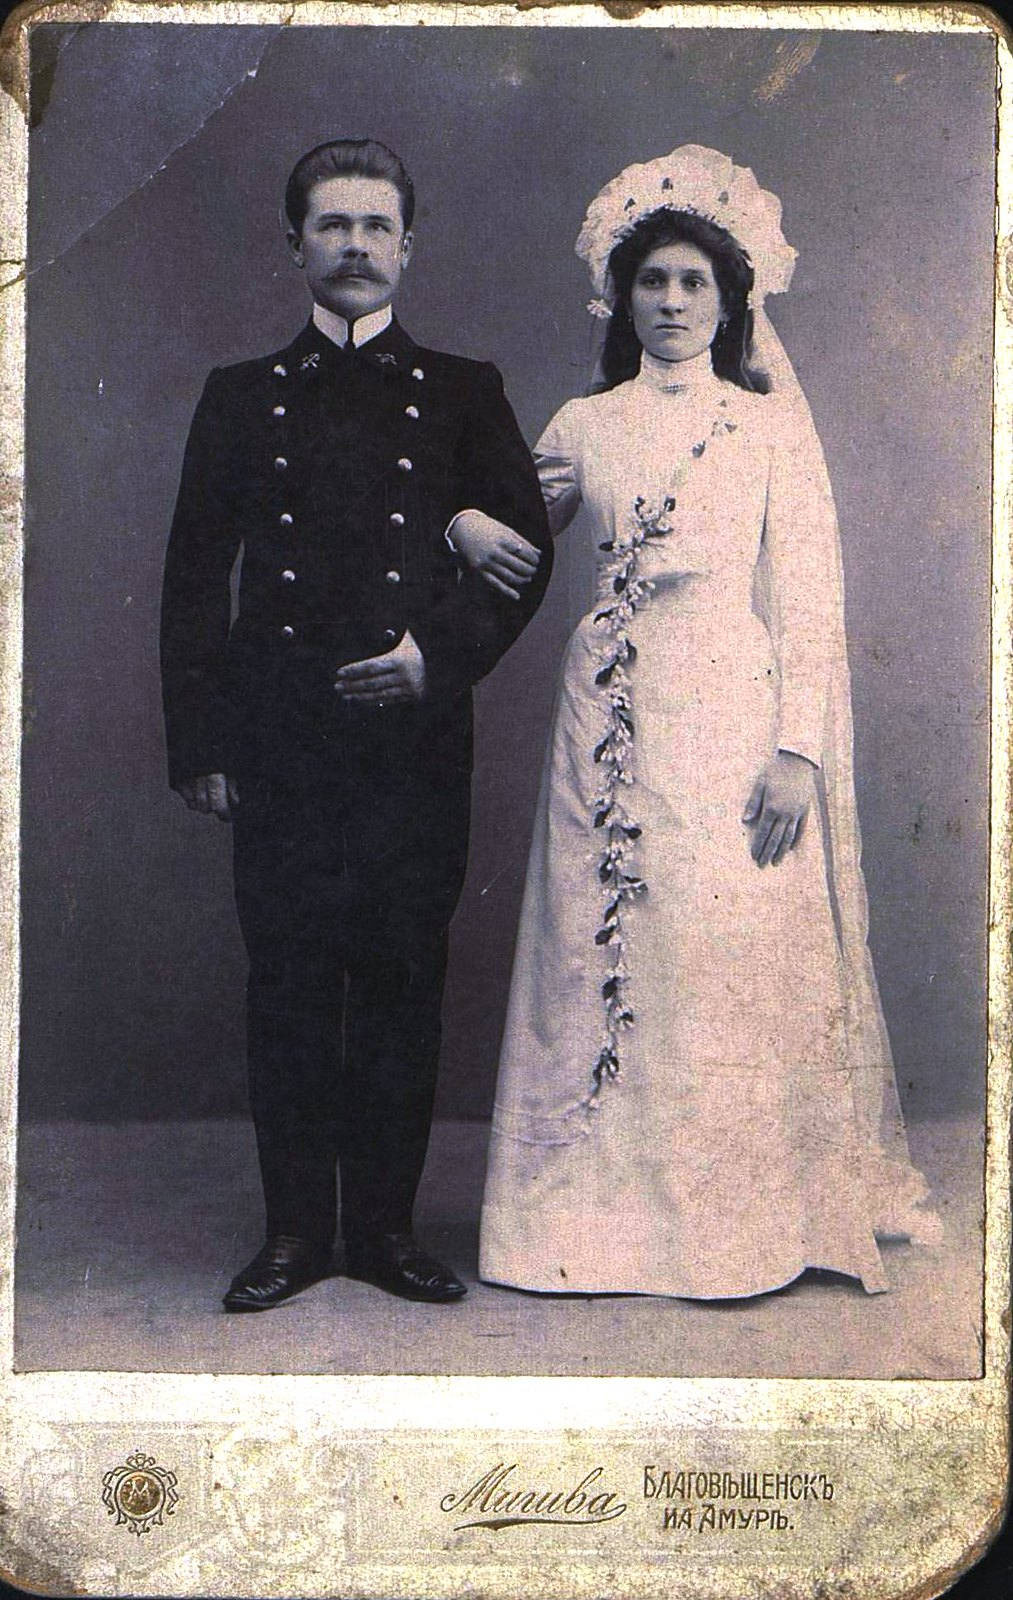 Ященко Пантелеймон Денисович, лоцман Амурского общества пароходства и торговли, и его жена Александра Александровна.1909